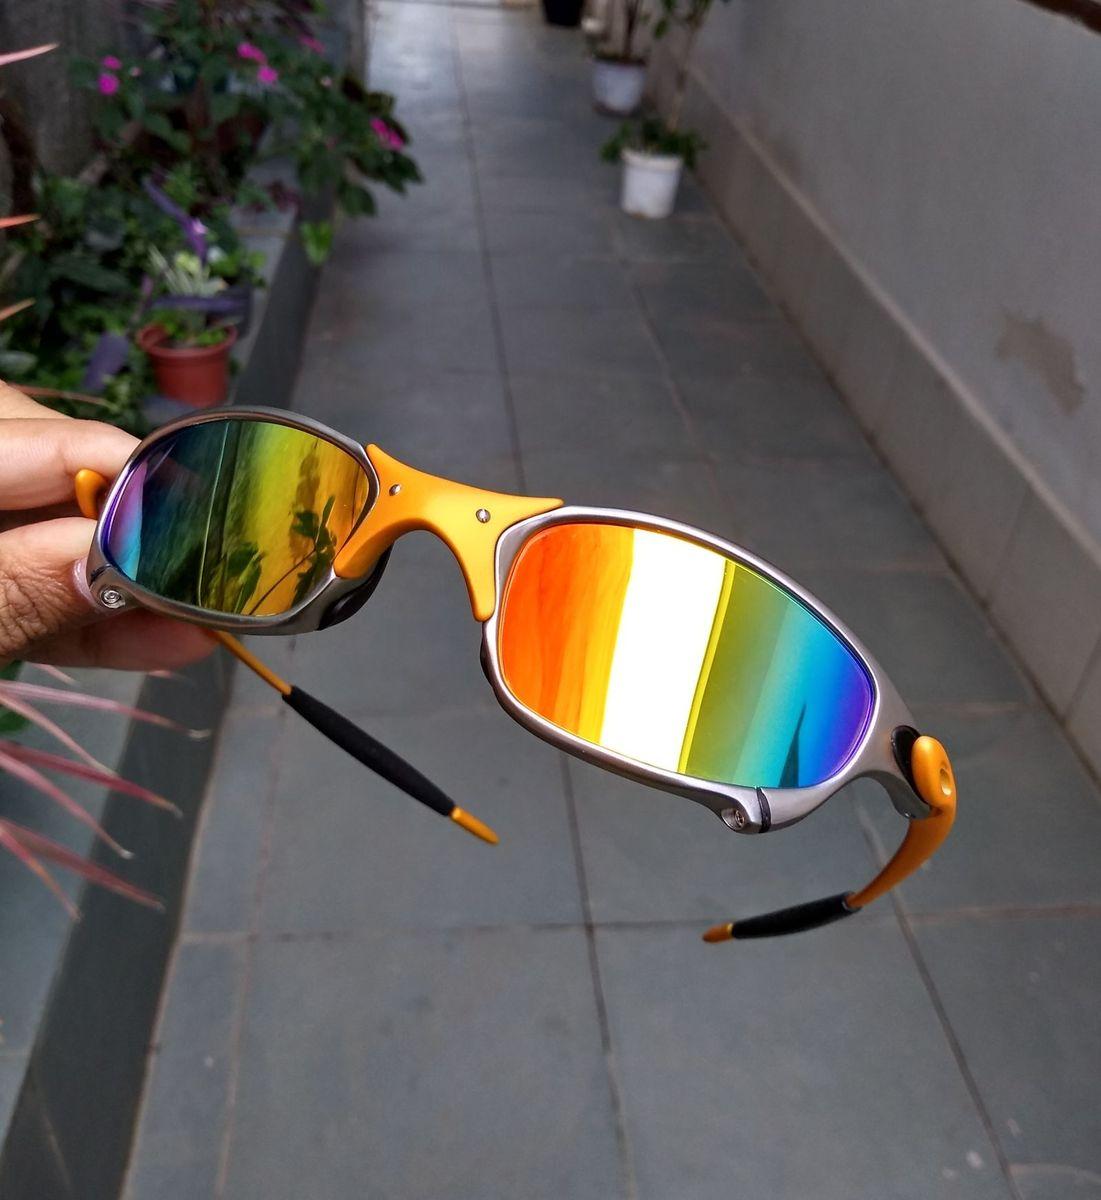 28d84ea32b8d9 Oakley juliet lente arco íris Óculos masculino oakley juliet nunca jpg  1101x1200 Fotos de juliet lente